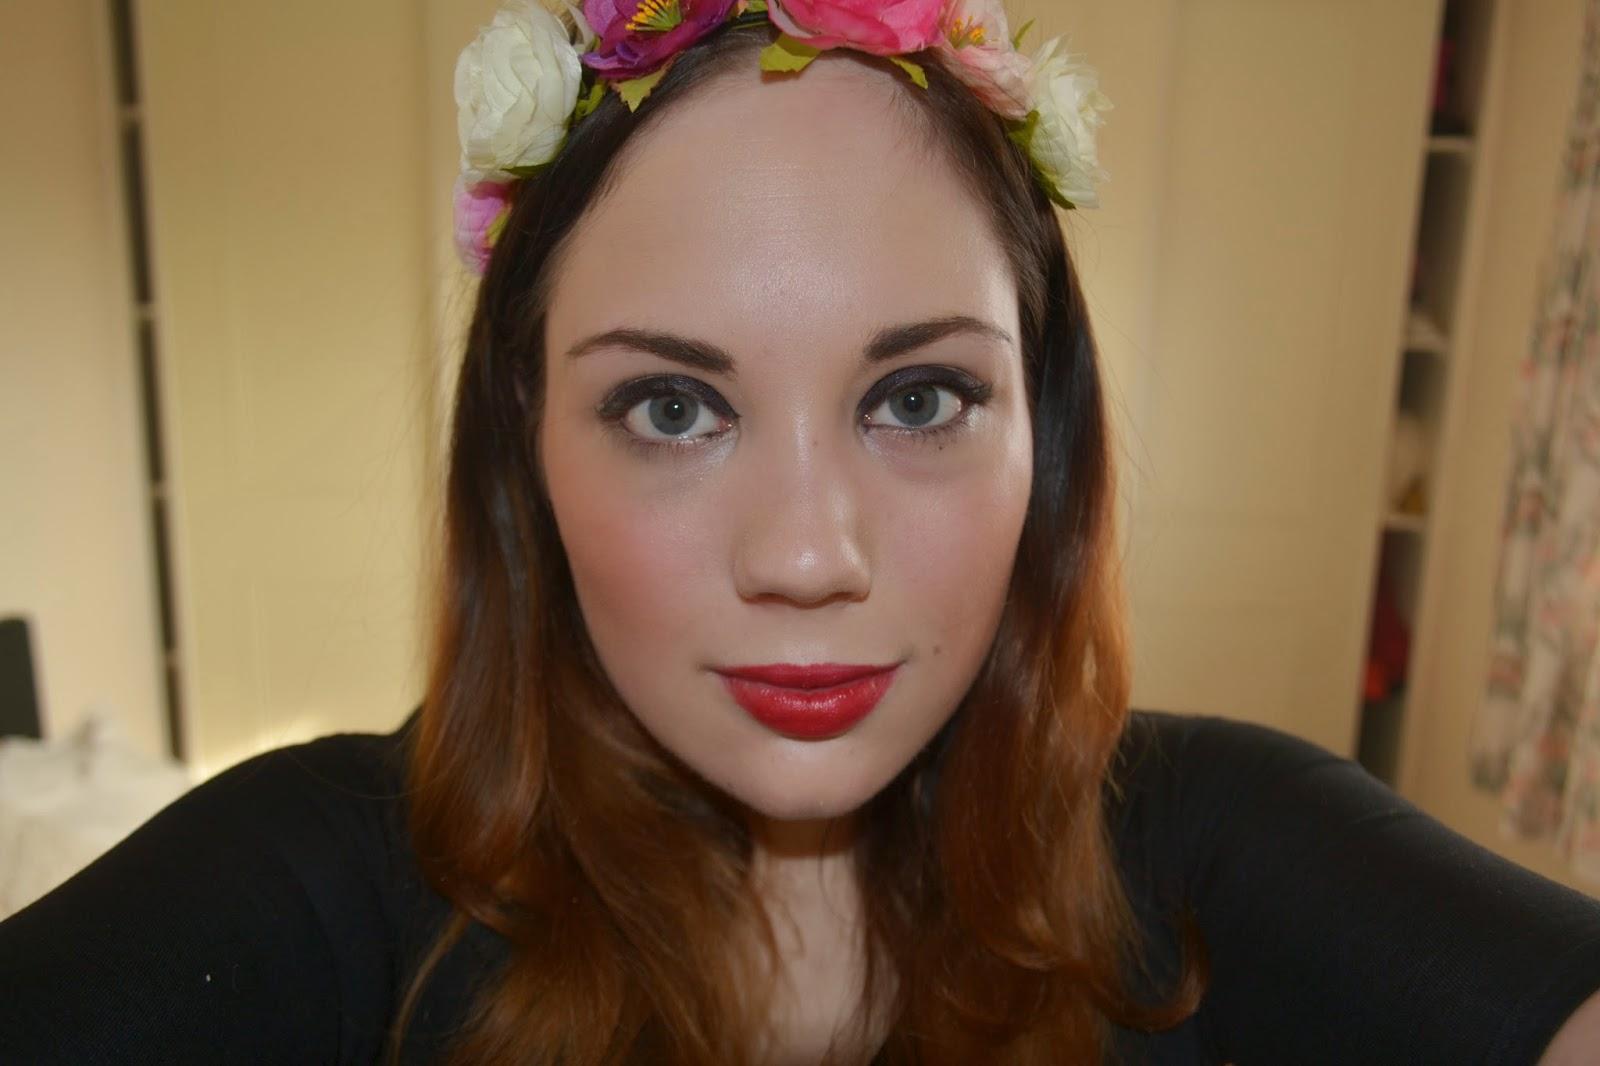 Festival Makeup